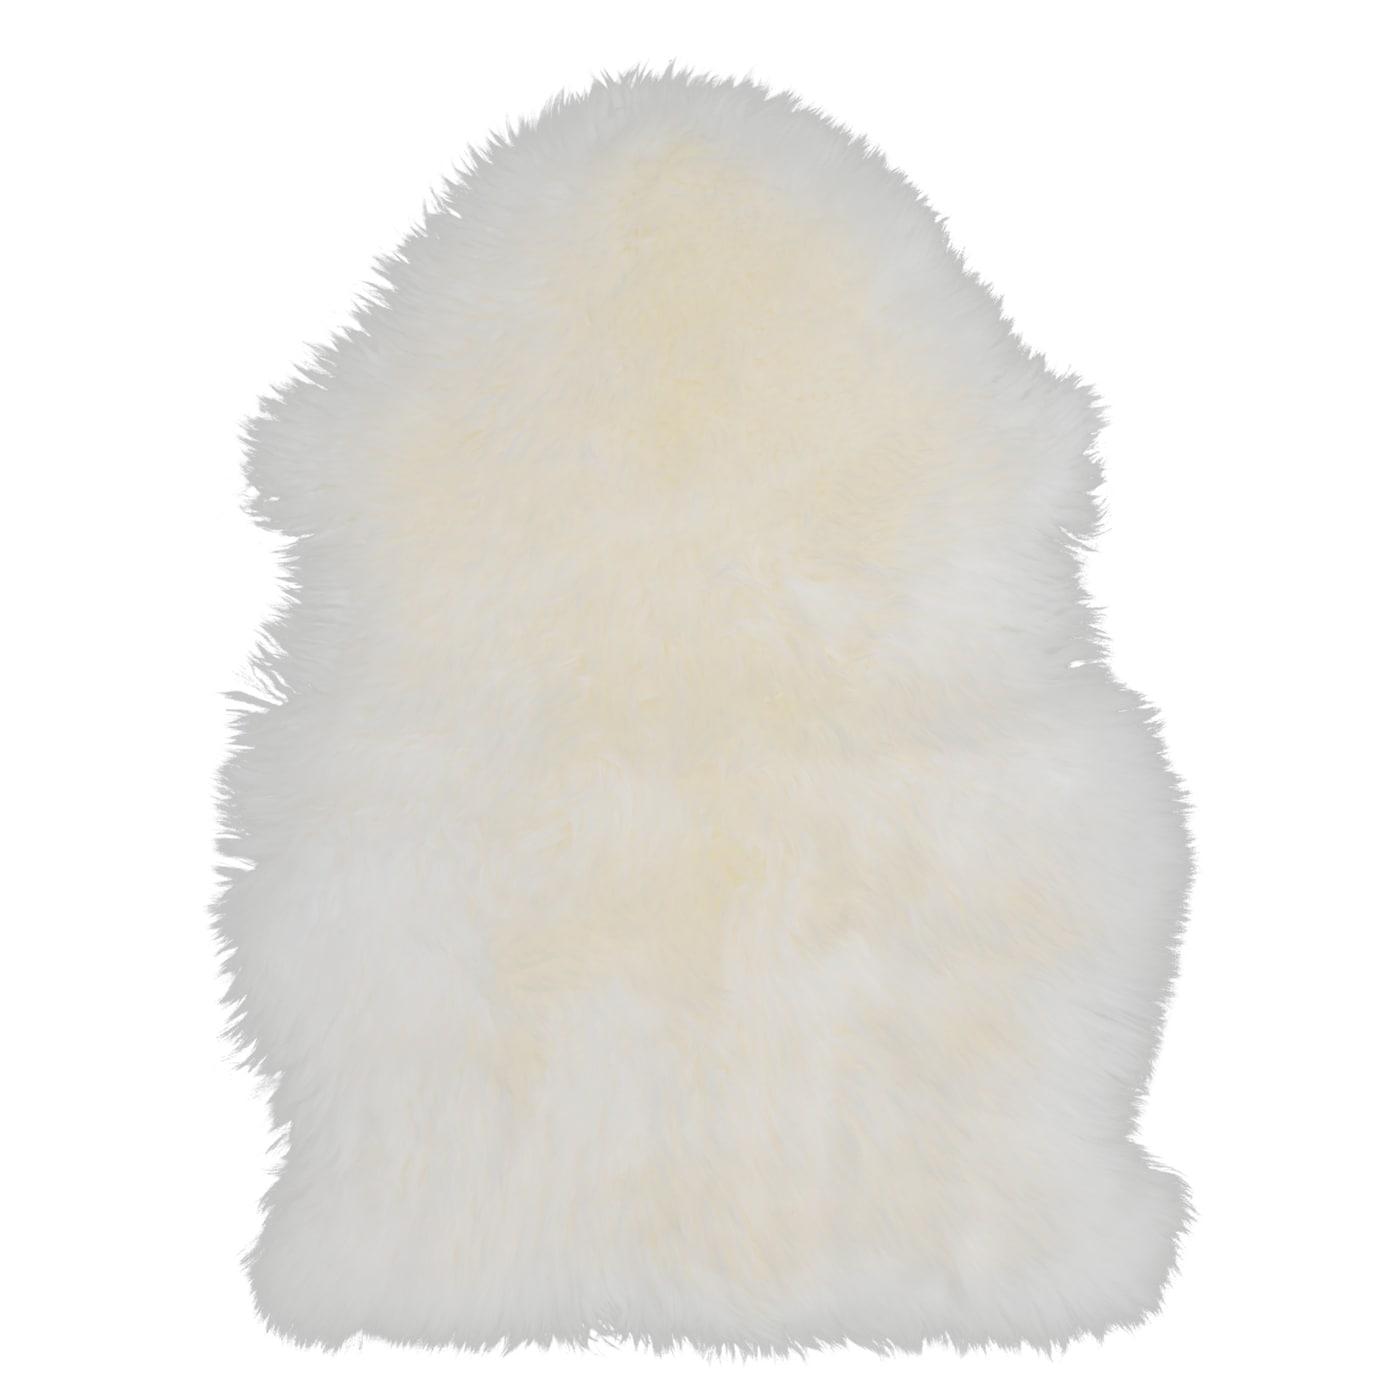 SKOLD Sheepskin White cm IKEA